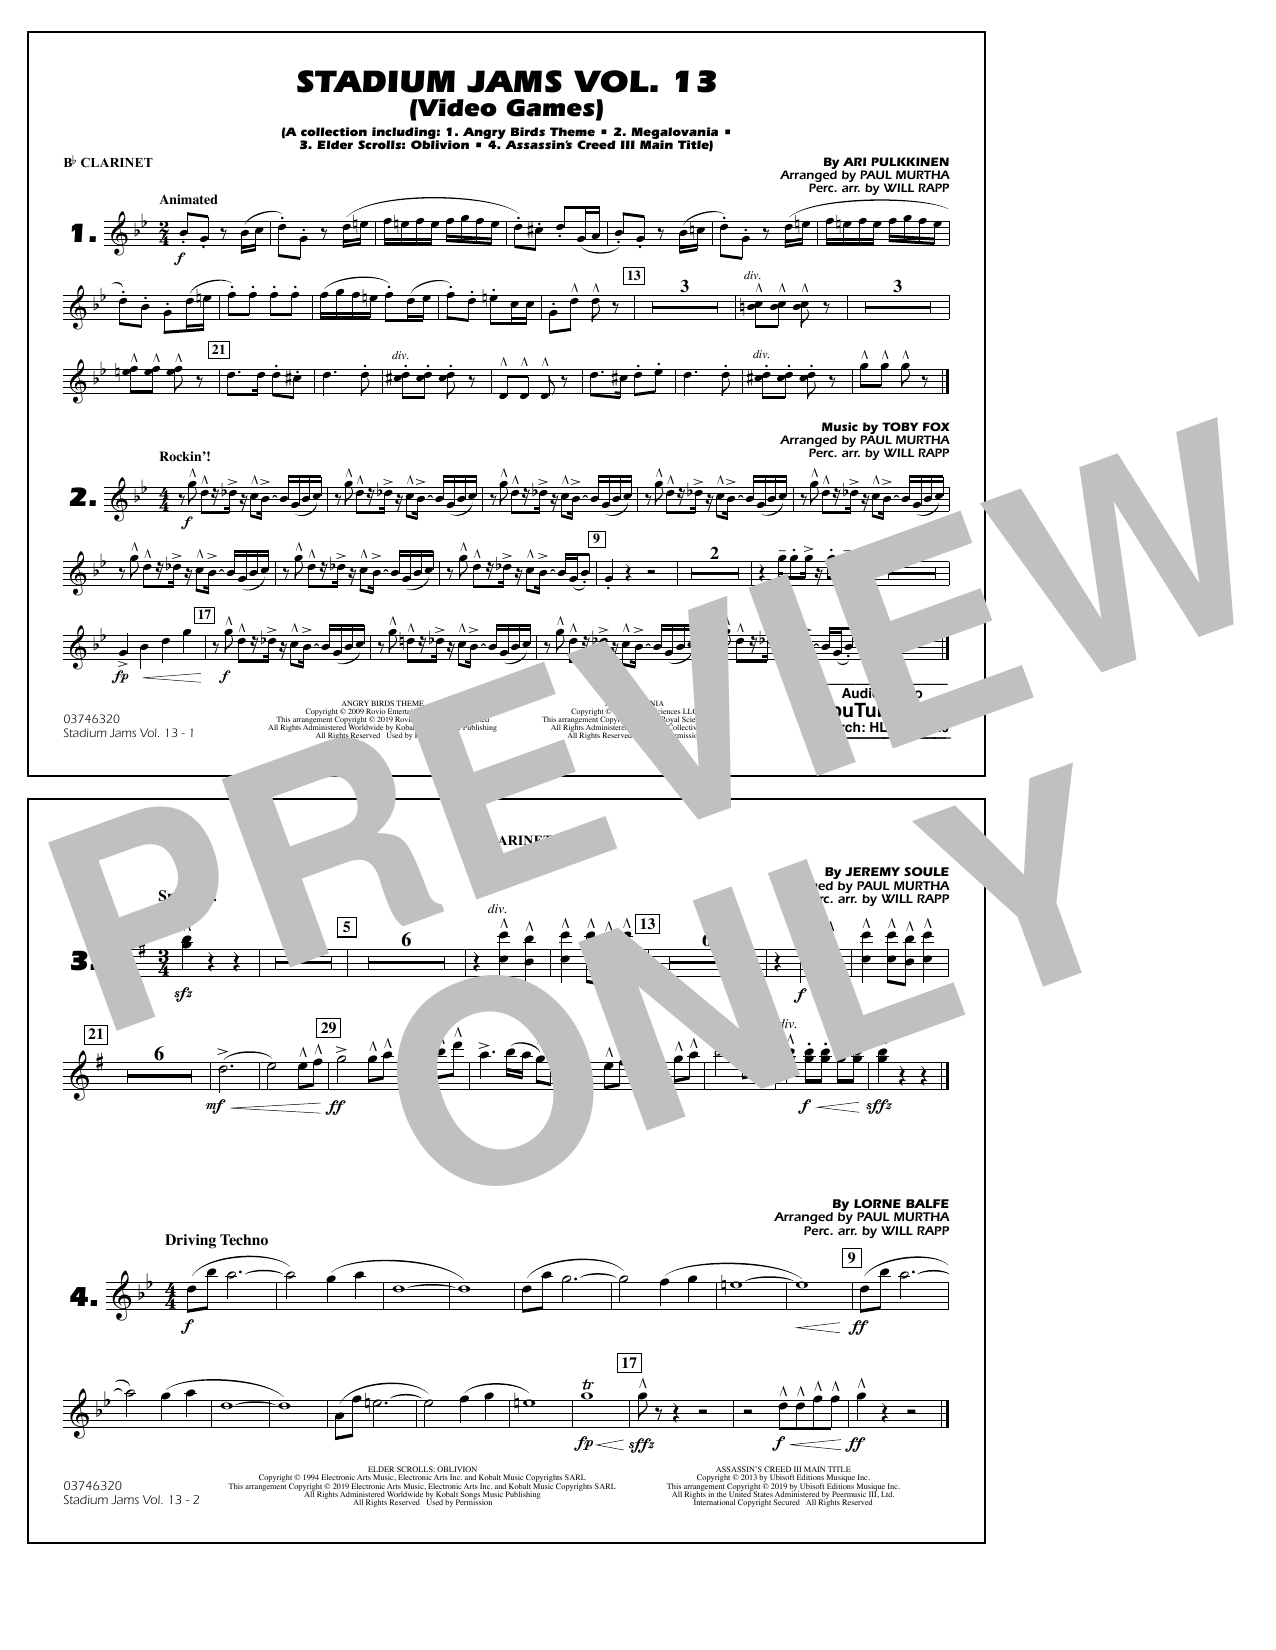 Paul Murtha & Will Rapp 'Stadium Jams Volume 13 (Video Games) - Bb  Clarinet' Sheet Music Notes, Chords | Download Printable Marching Band -  SKU: